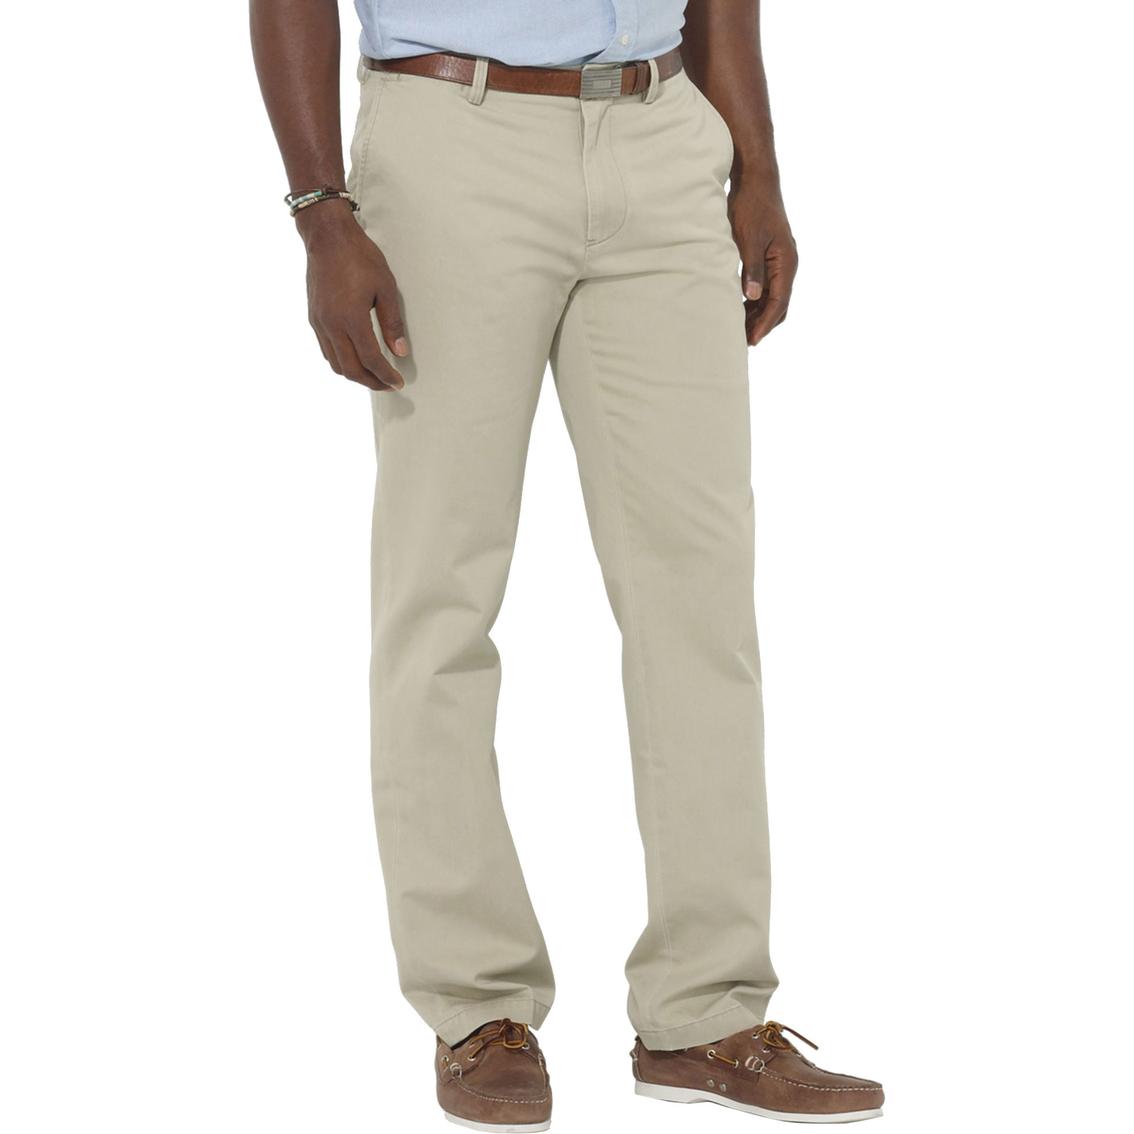 Ralph Bigamp; Fit Flat Pants Tall Front Polo Lauren Classic Chino dxsQrCthB